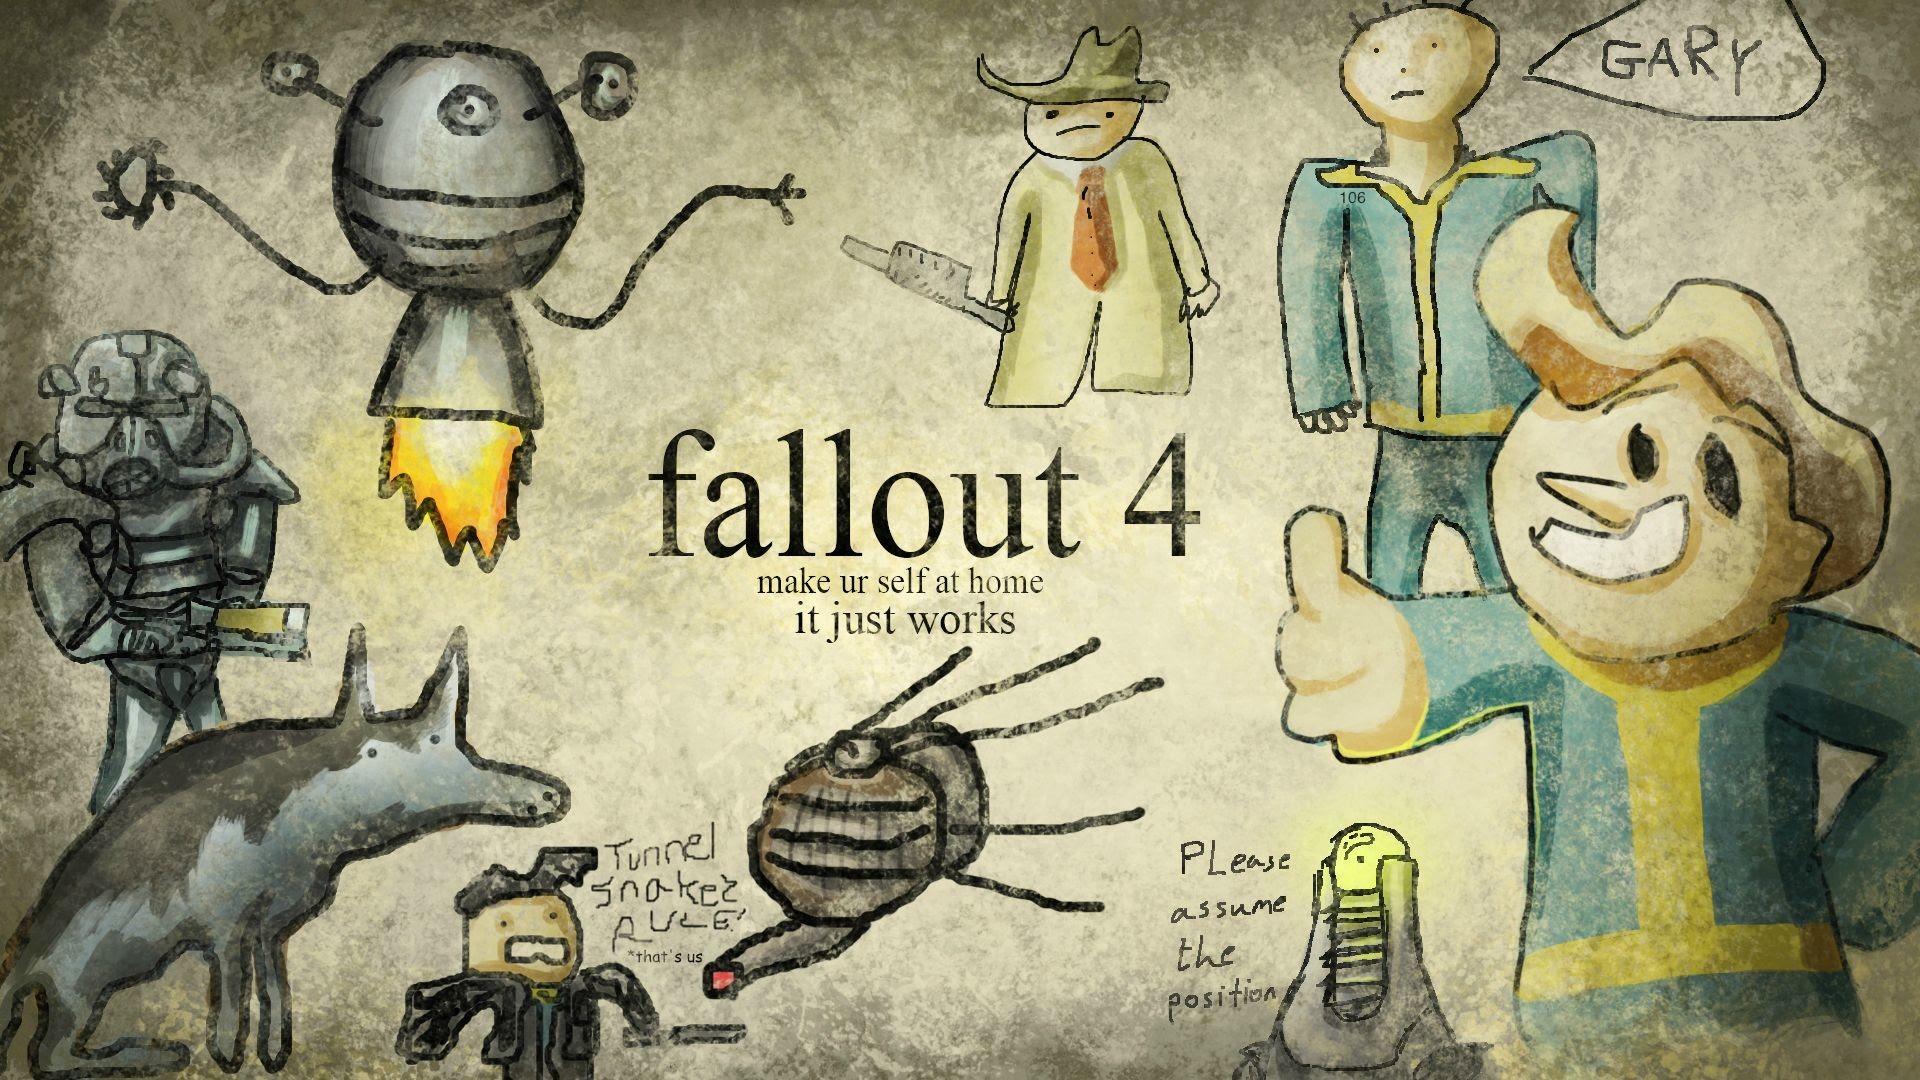 Fallout 4 Wallpaper 1920x1080 77 Images Images, Photos, Reviews